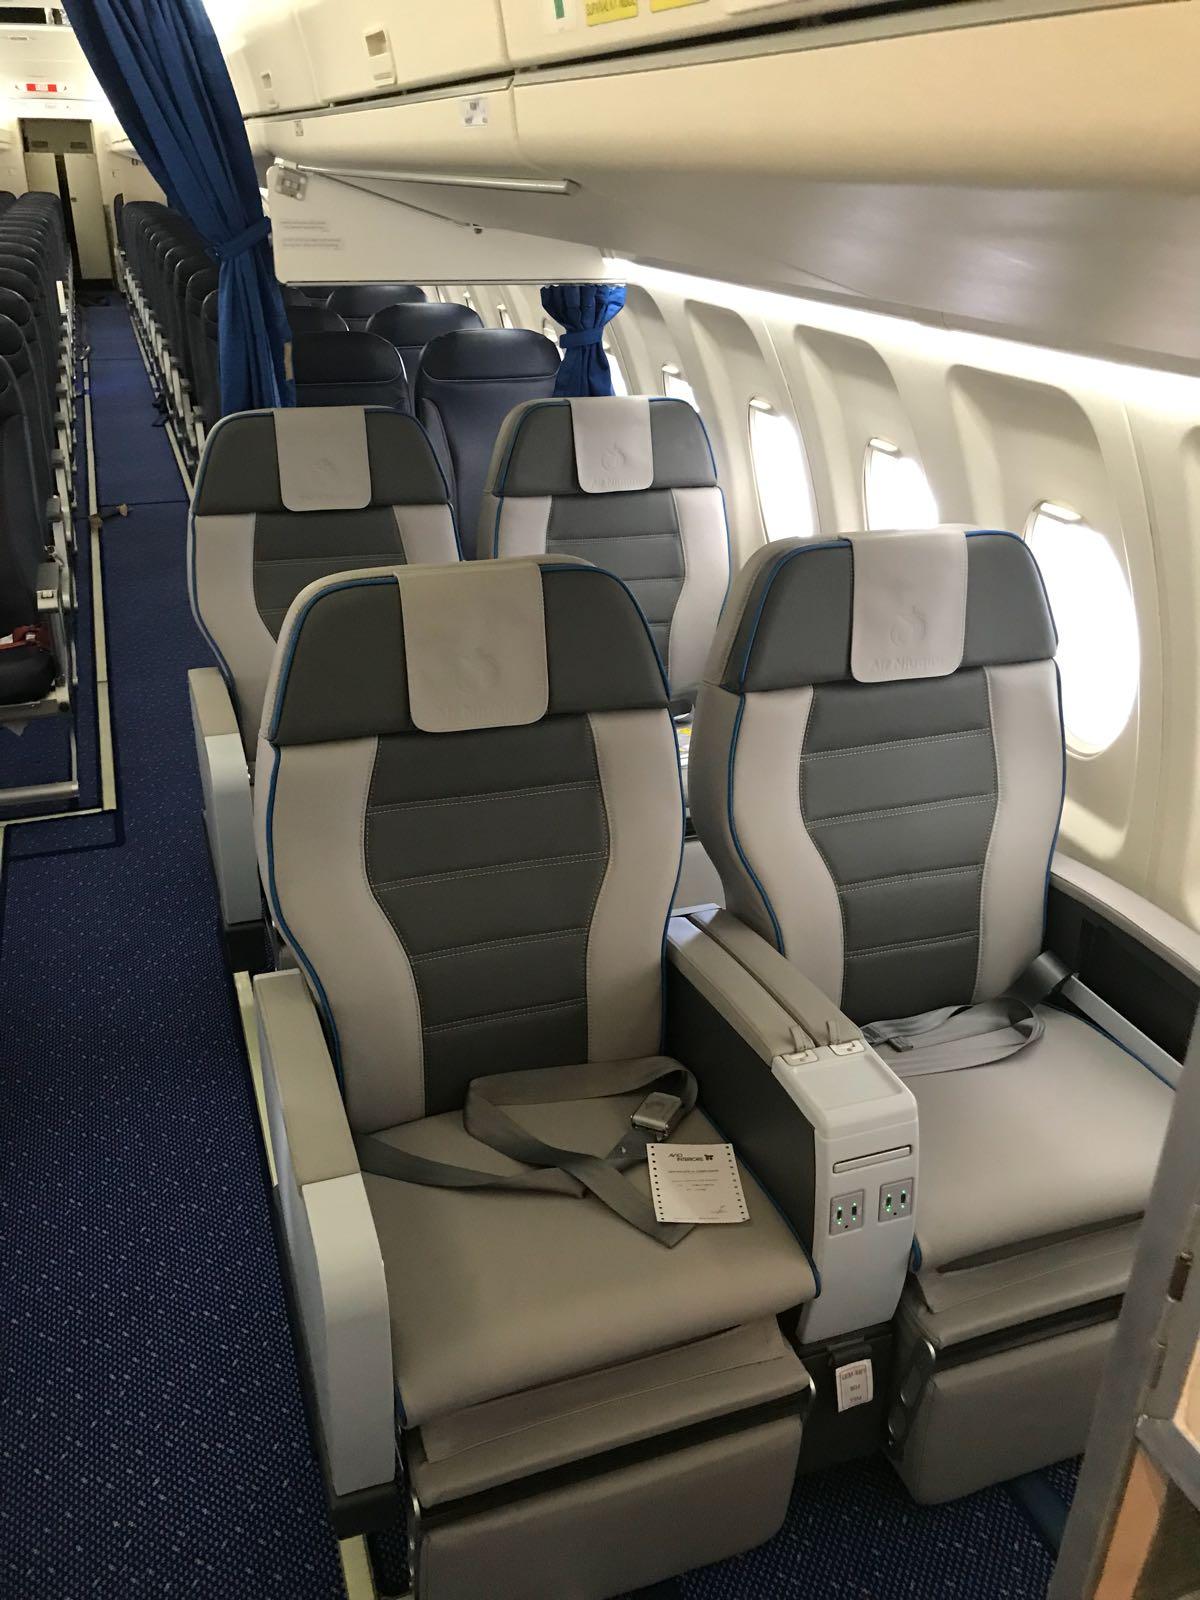 Air Niugini new Fokker fleet with Aviointeriors seats